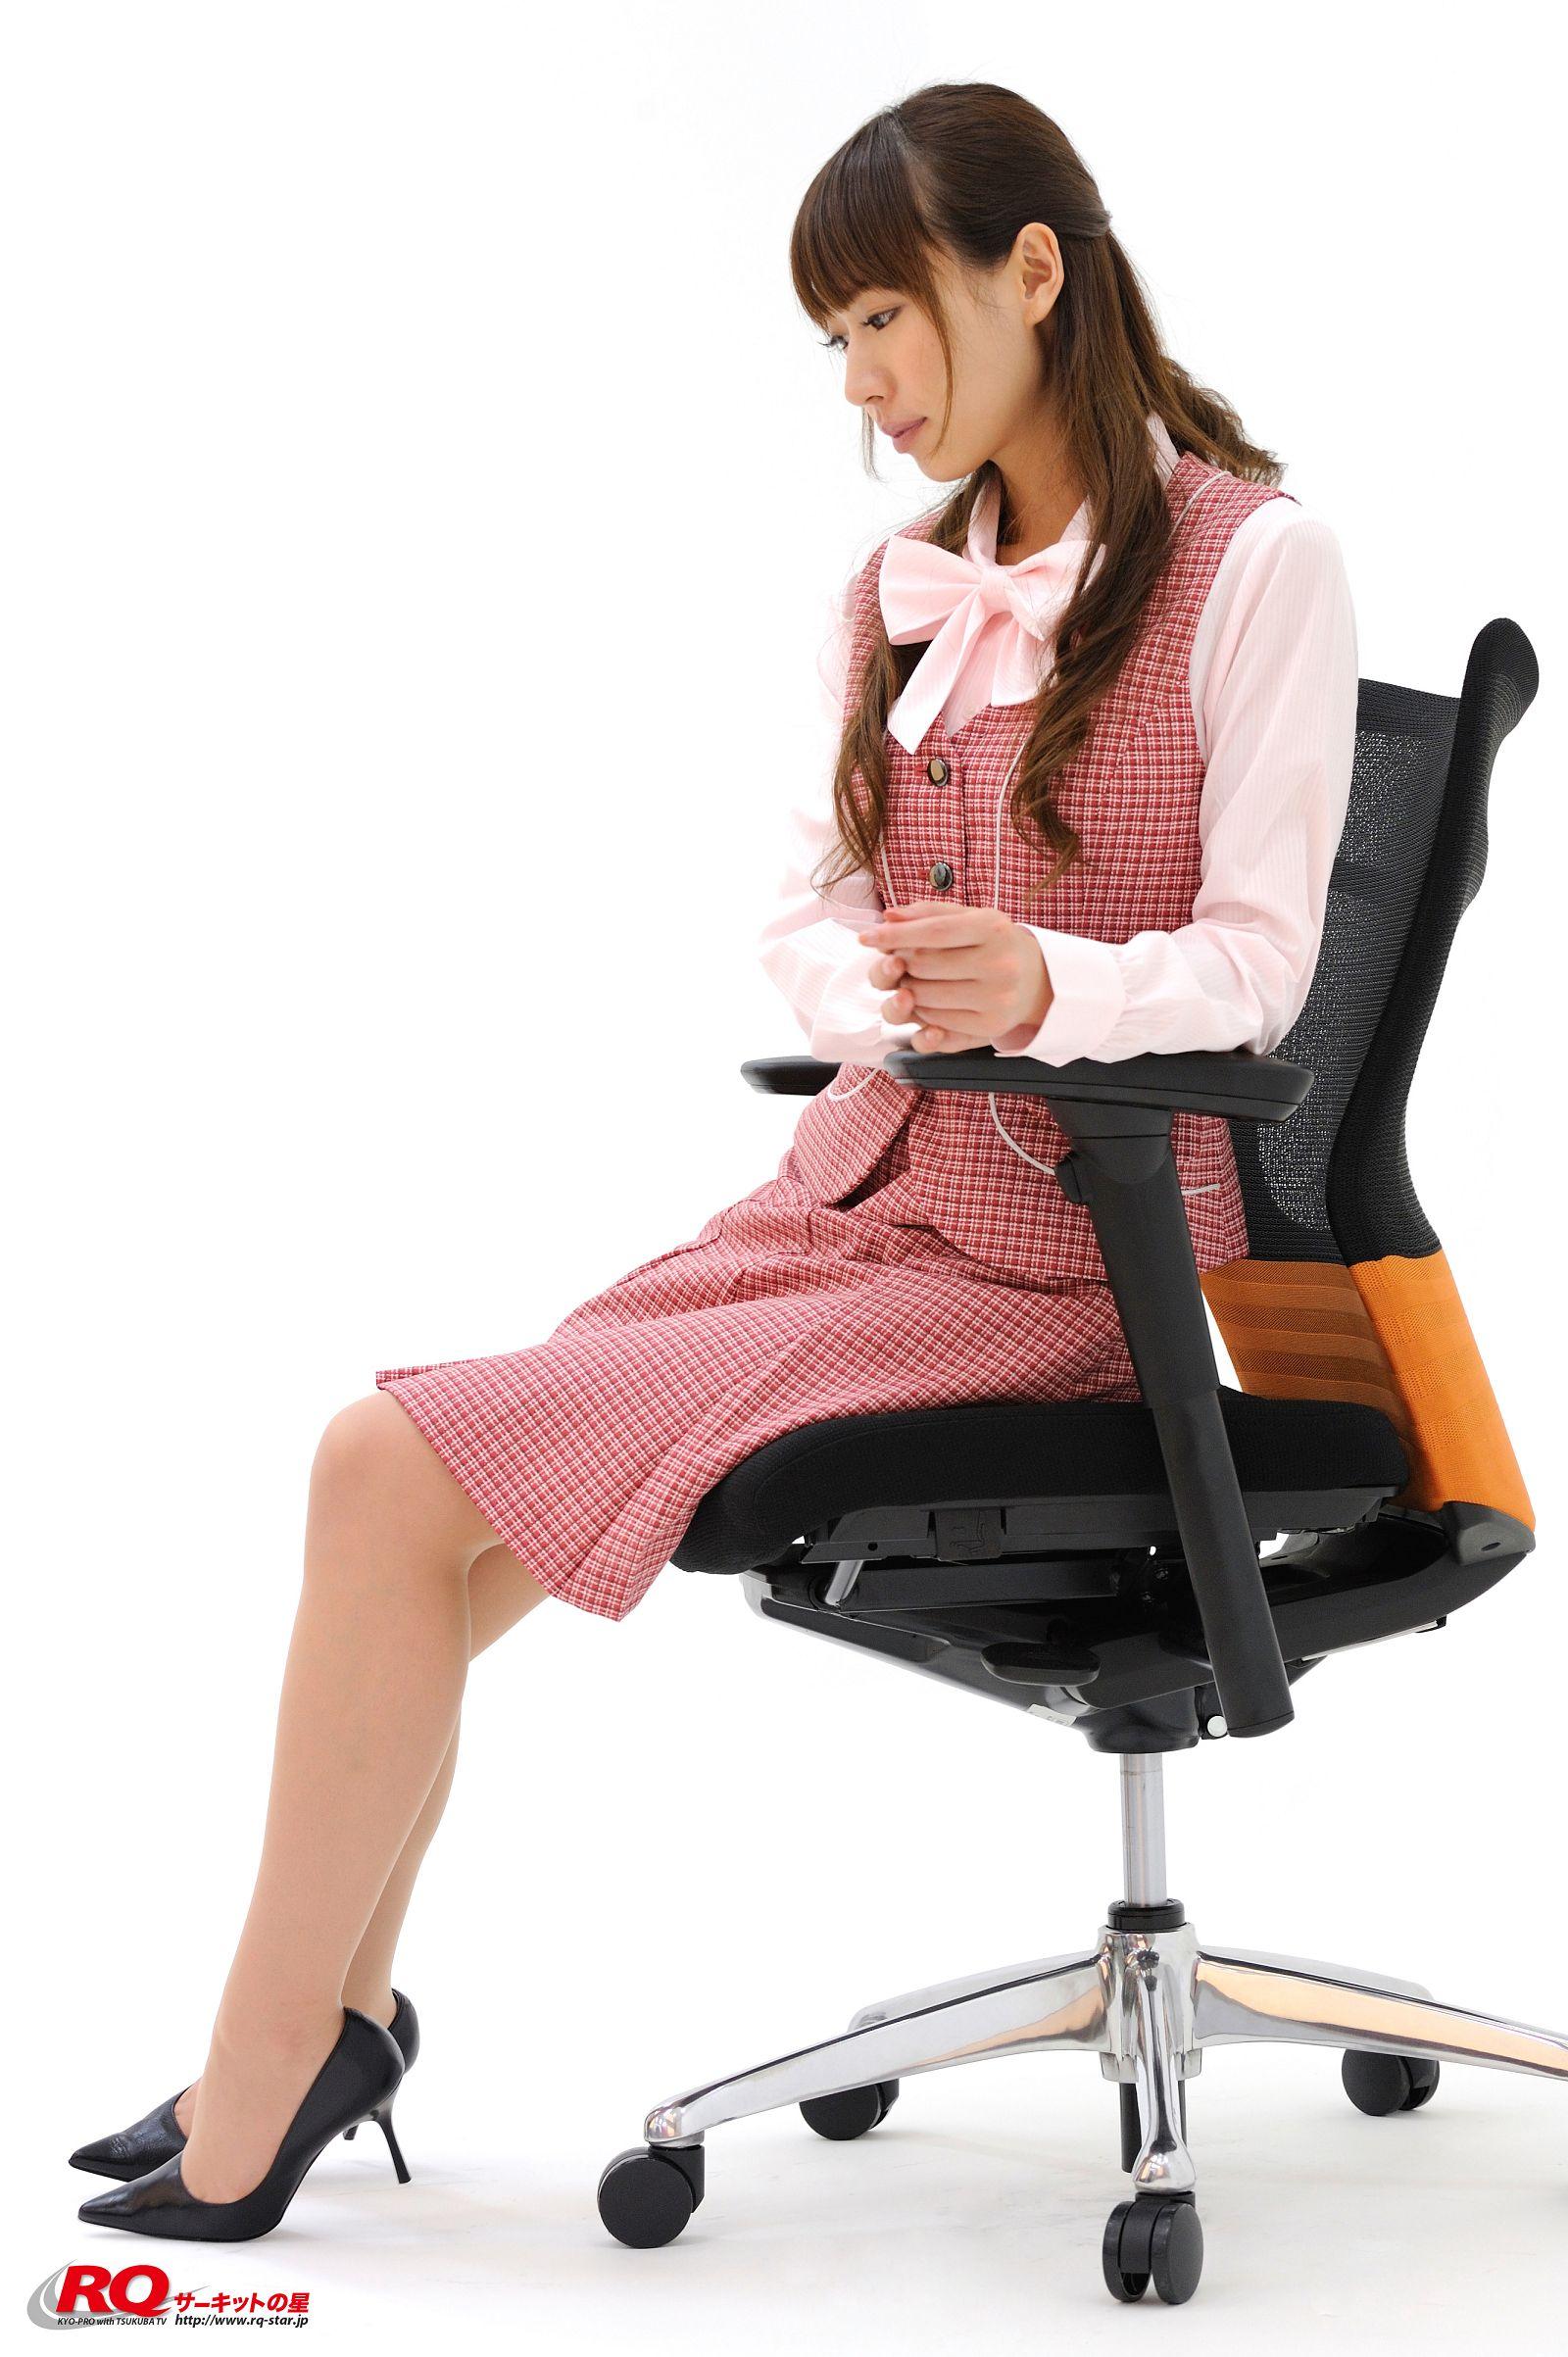 [RQ STAR美女] NO.0114 Rina Yamamoto 山本里奈 Office Lady[68P] RQ STAR 第2张